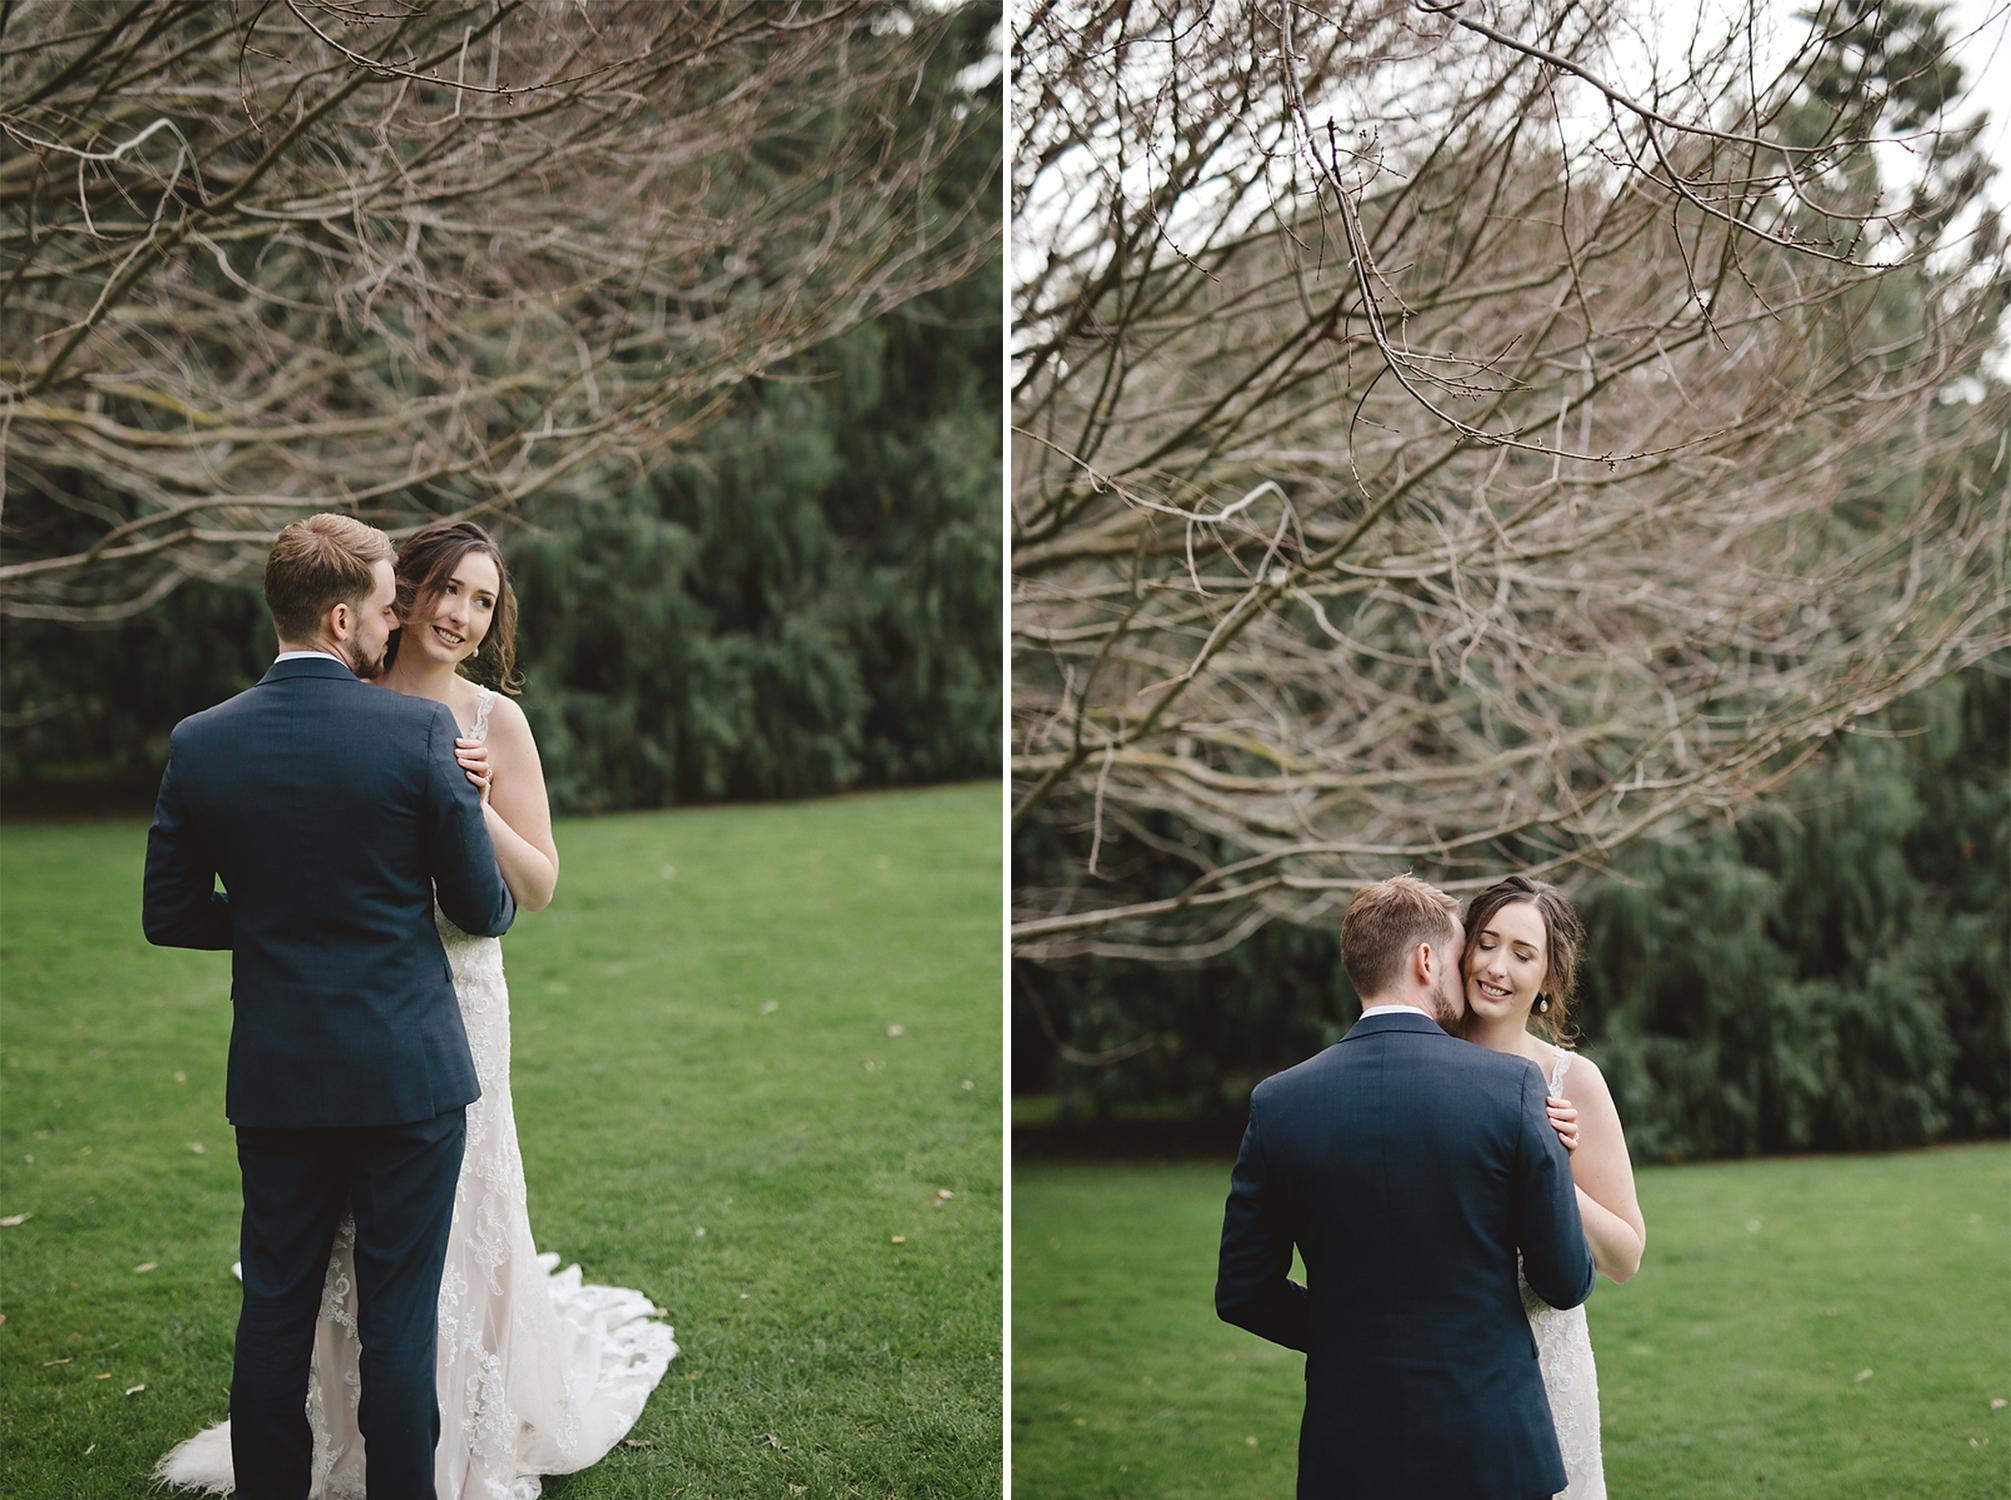 wellington wedding photography NZ - 0162.JPG